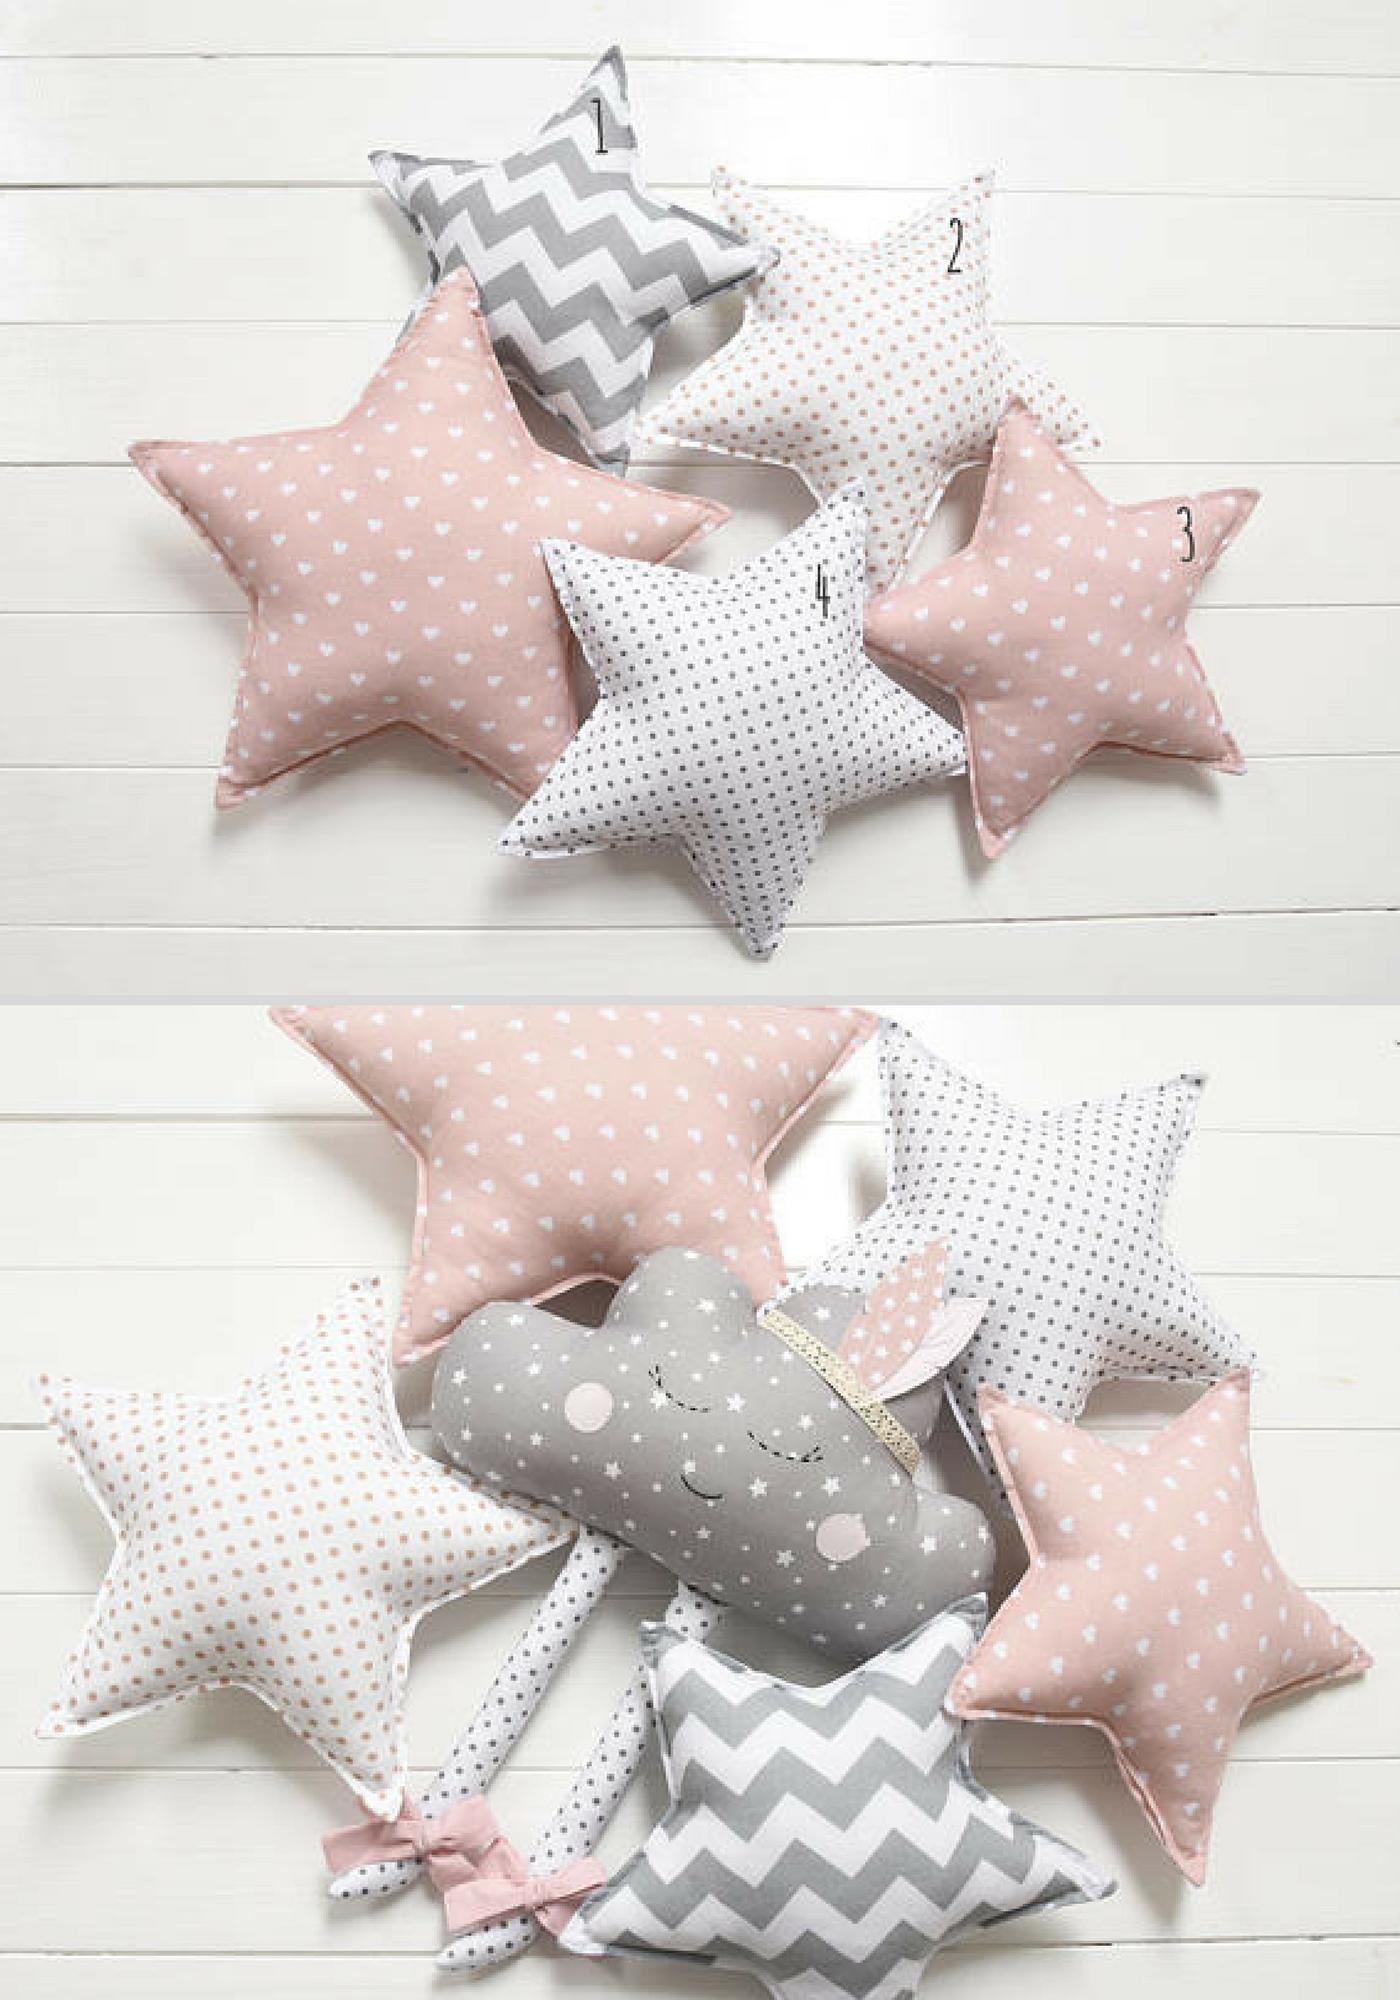 Star Pillow Shaped Nursery Decor Kids Cushion Decorative